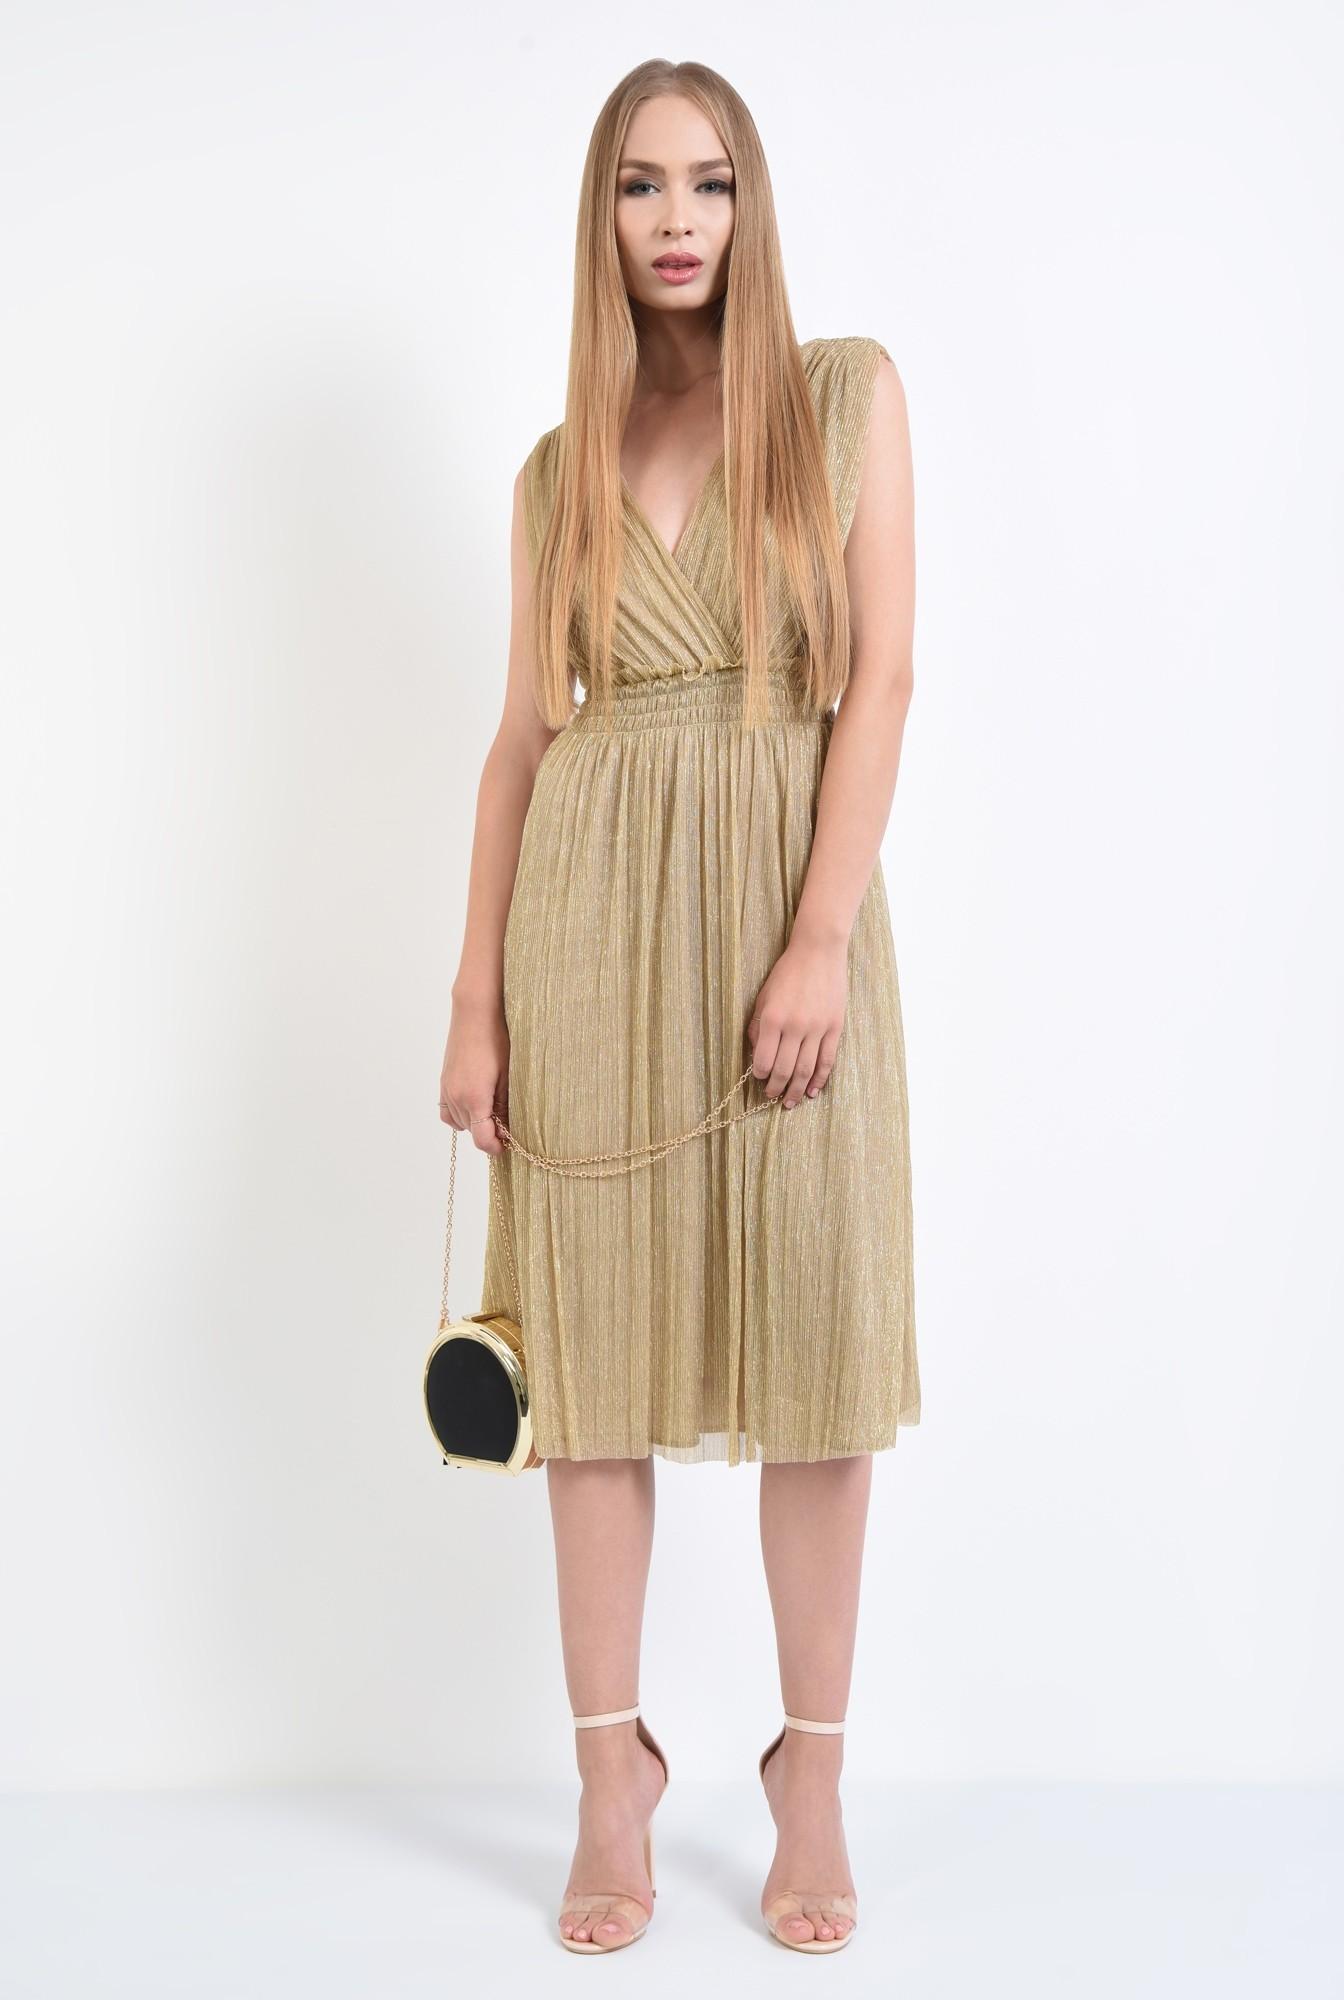 3 - rochie de ocazie, lurex, auriu, spate decoltat